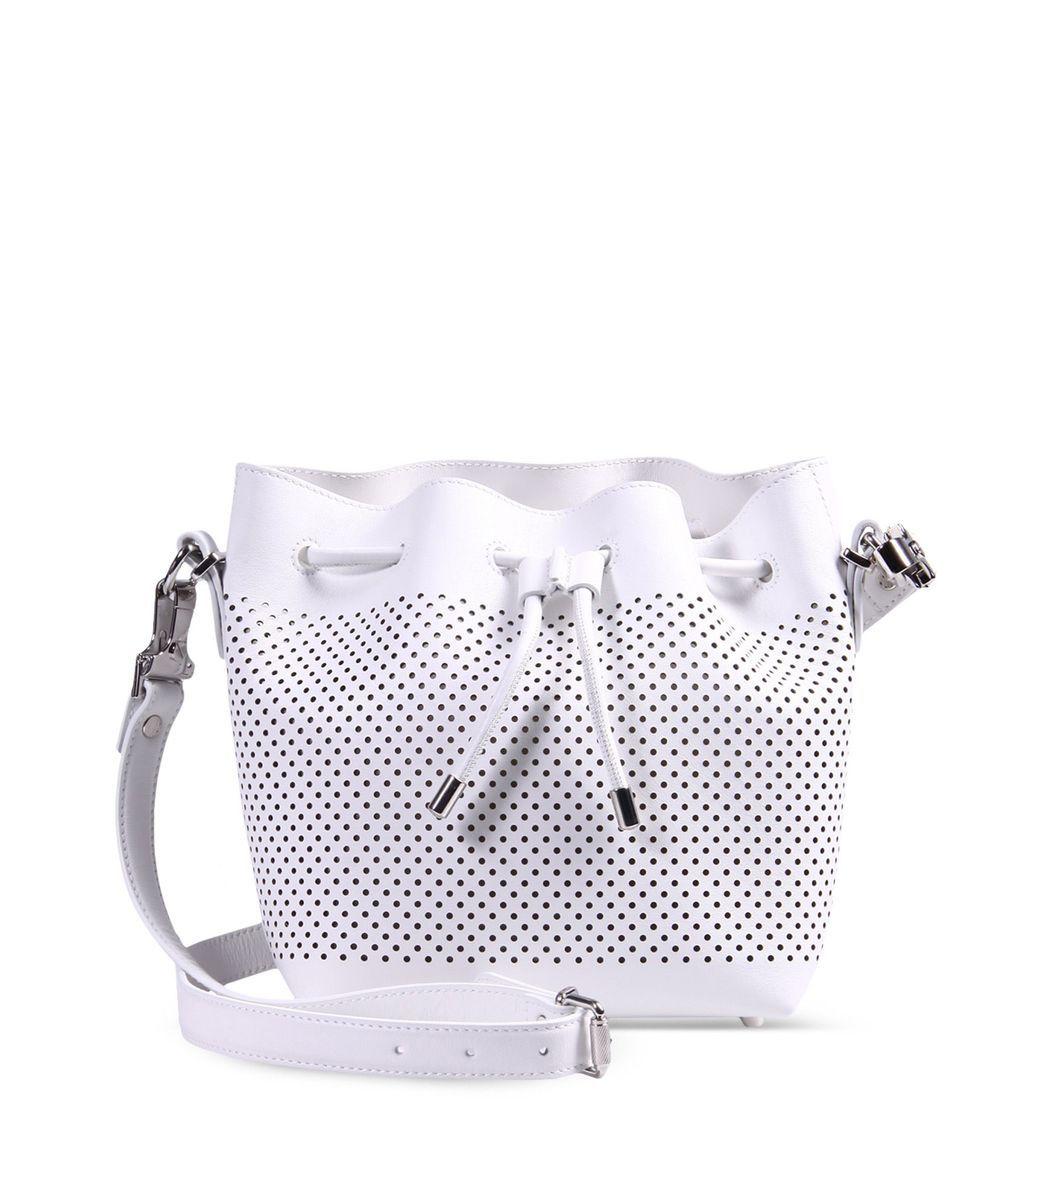 Designer Accessories - Shop Fashion Accessories